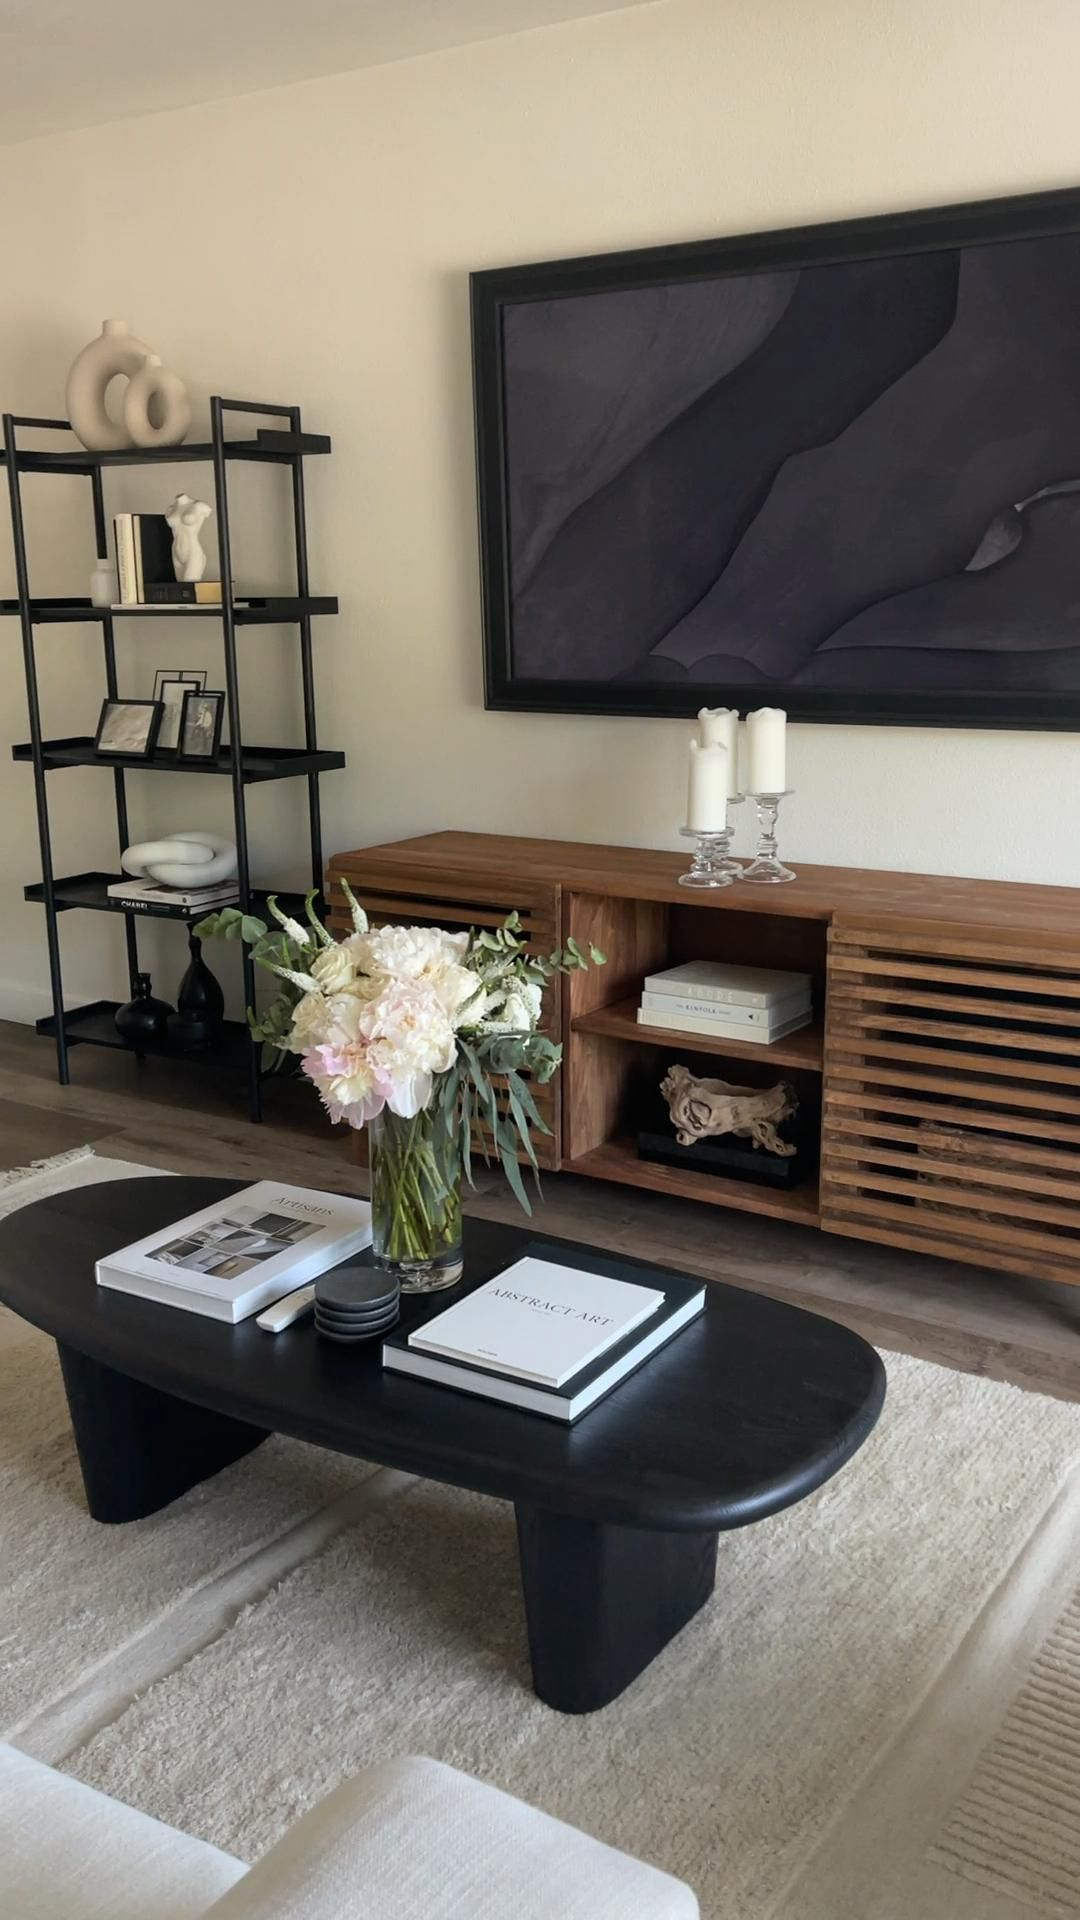 Living room decor inspiration || @josipellicano